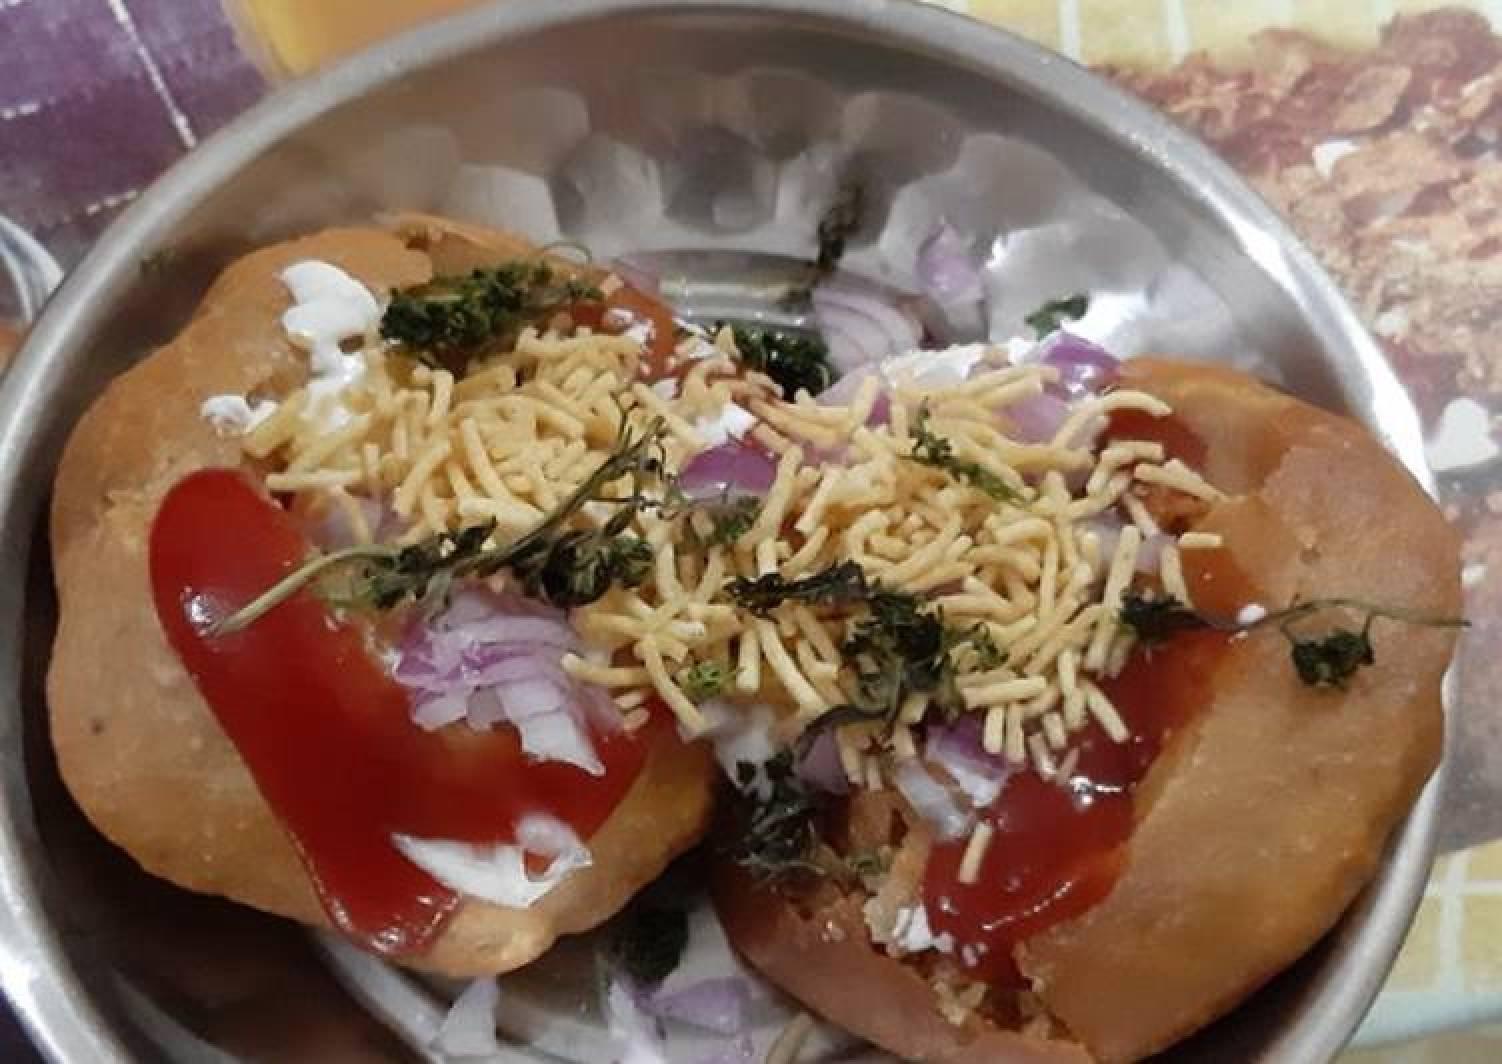 Jain MoongDal Whole Wheat Flour Kachori